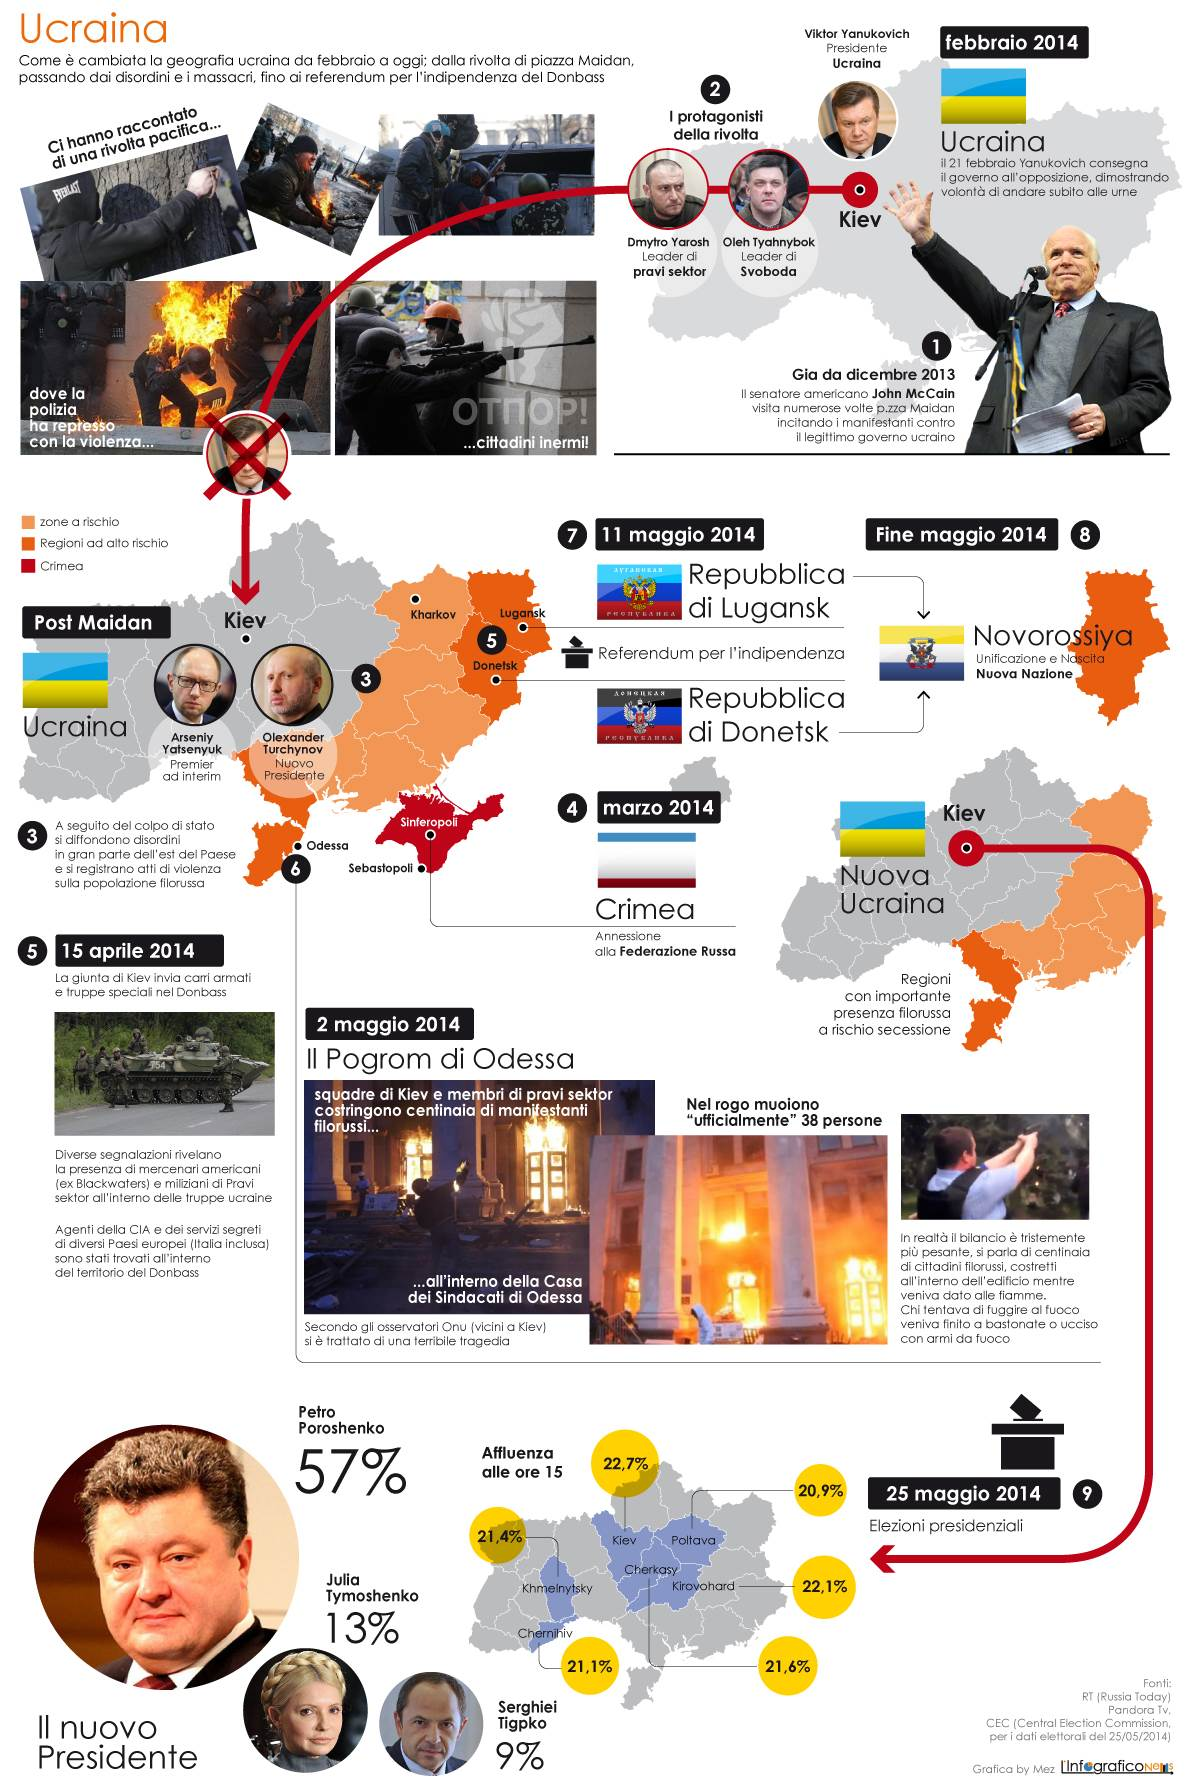 Nuova-Ucraina